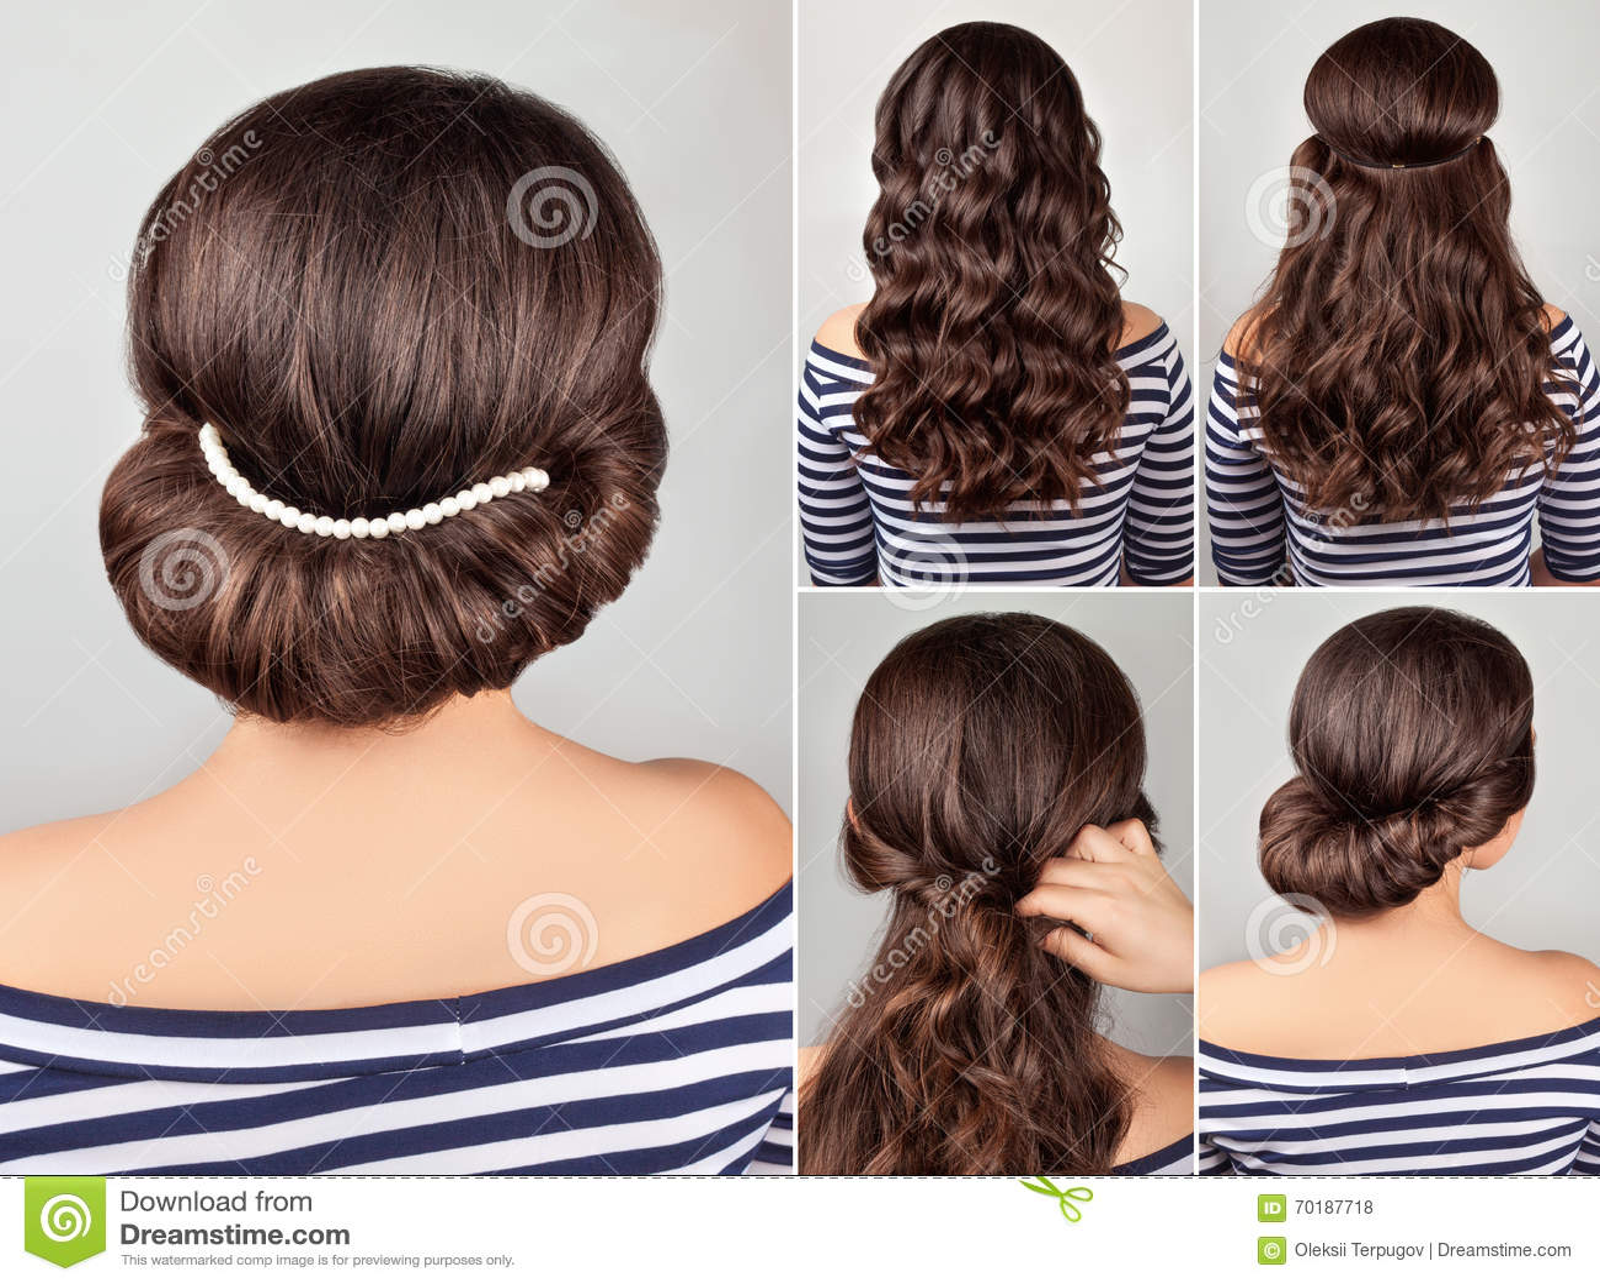 Greek Hairstyle Tutorial Stock Photo Image Of Fashion 70187718